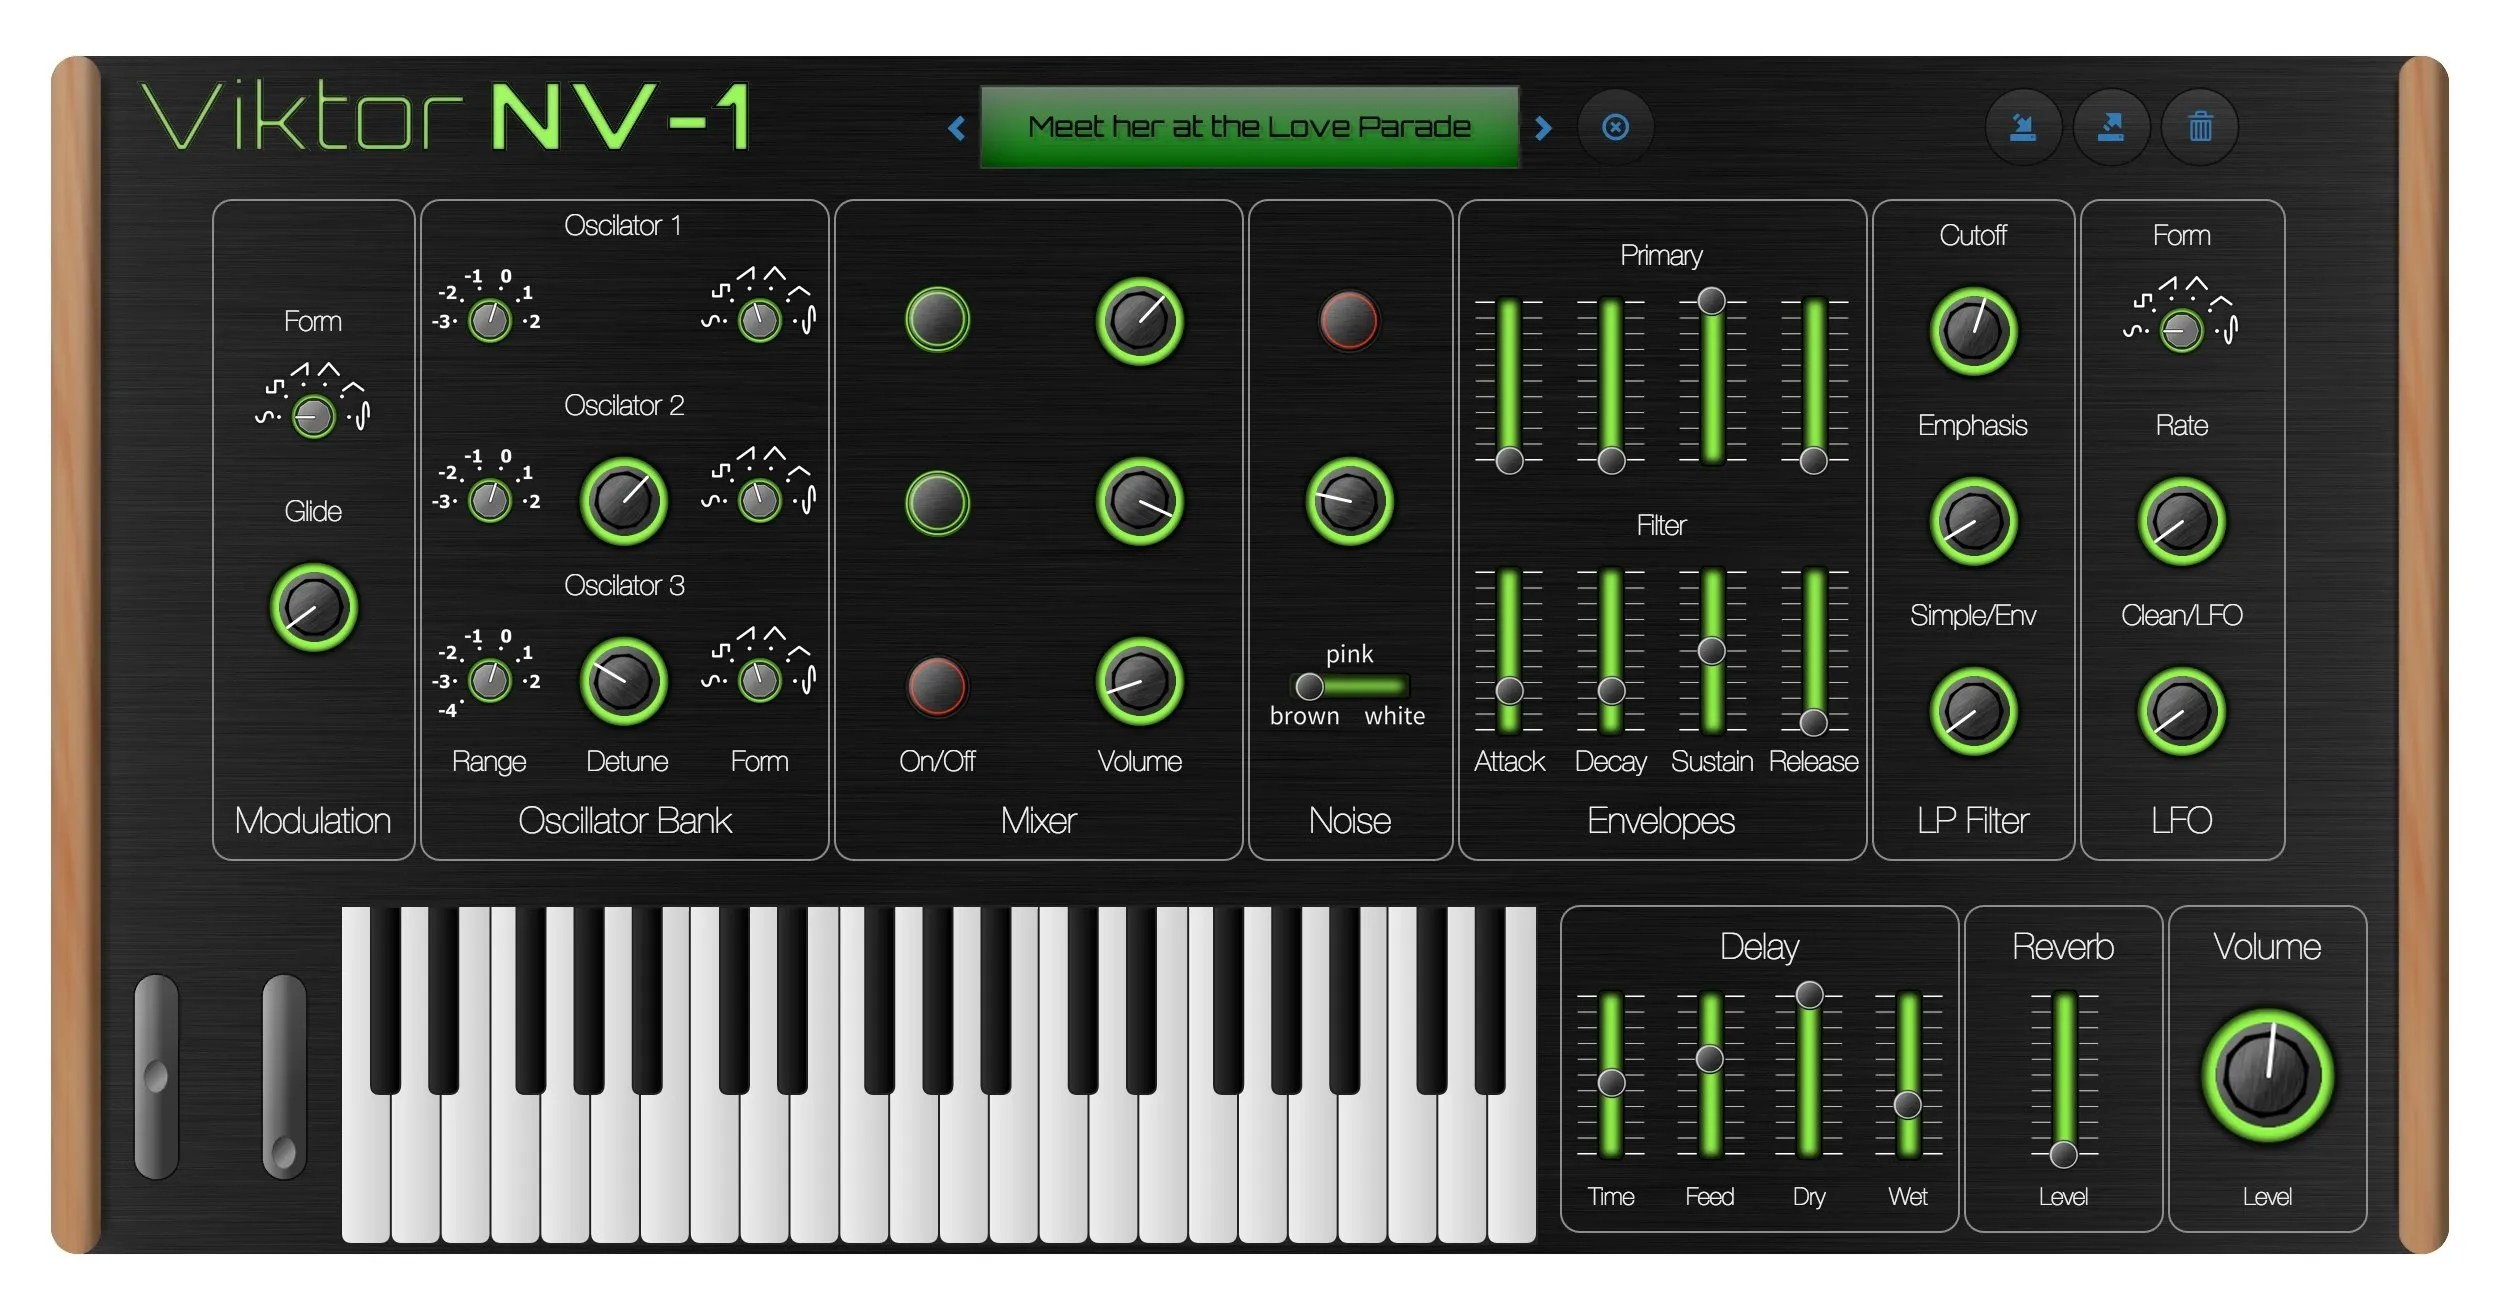 viktor nv-1 | Audio Plugins for Free